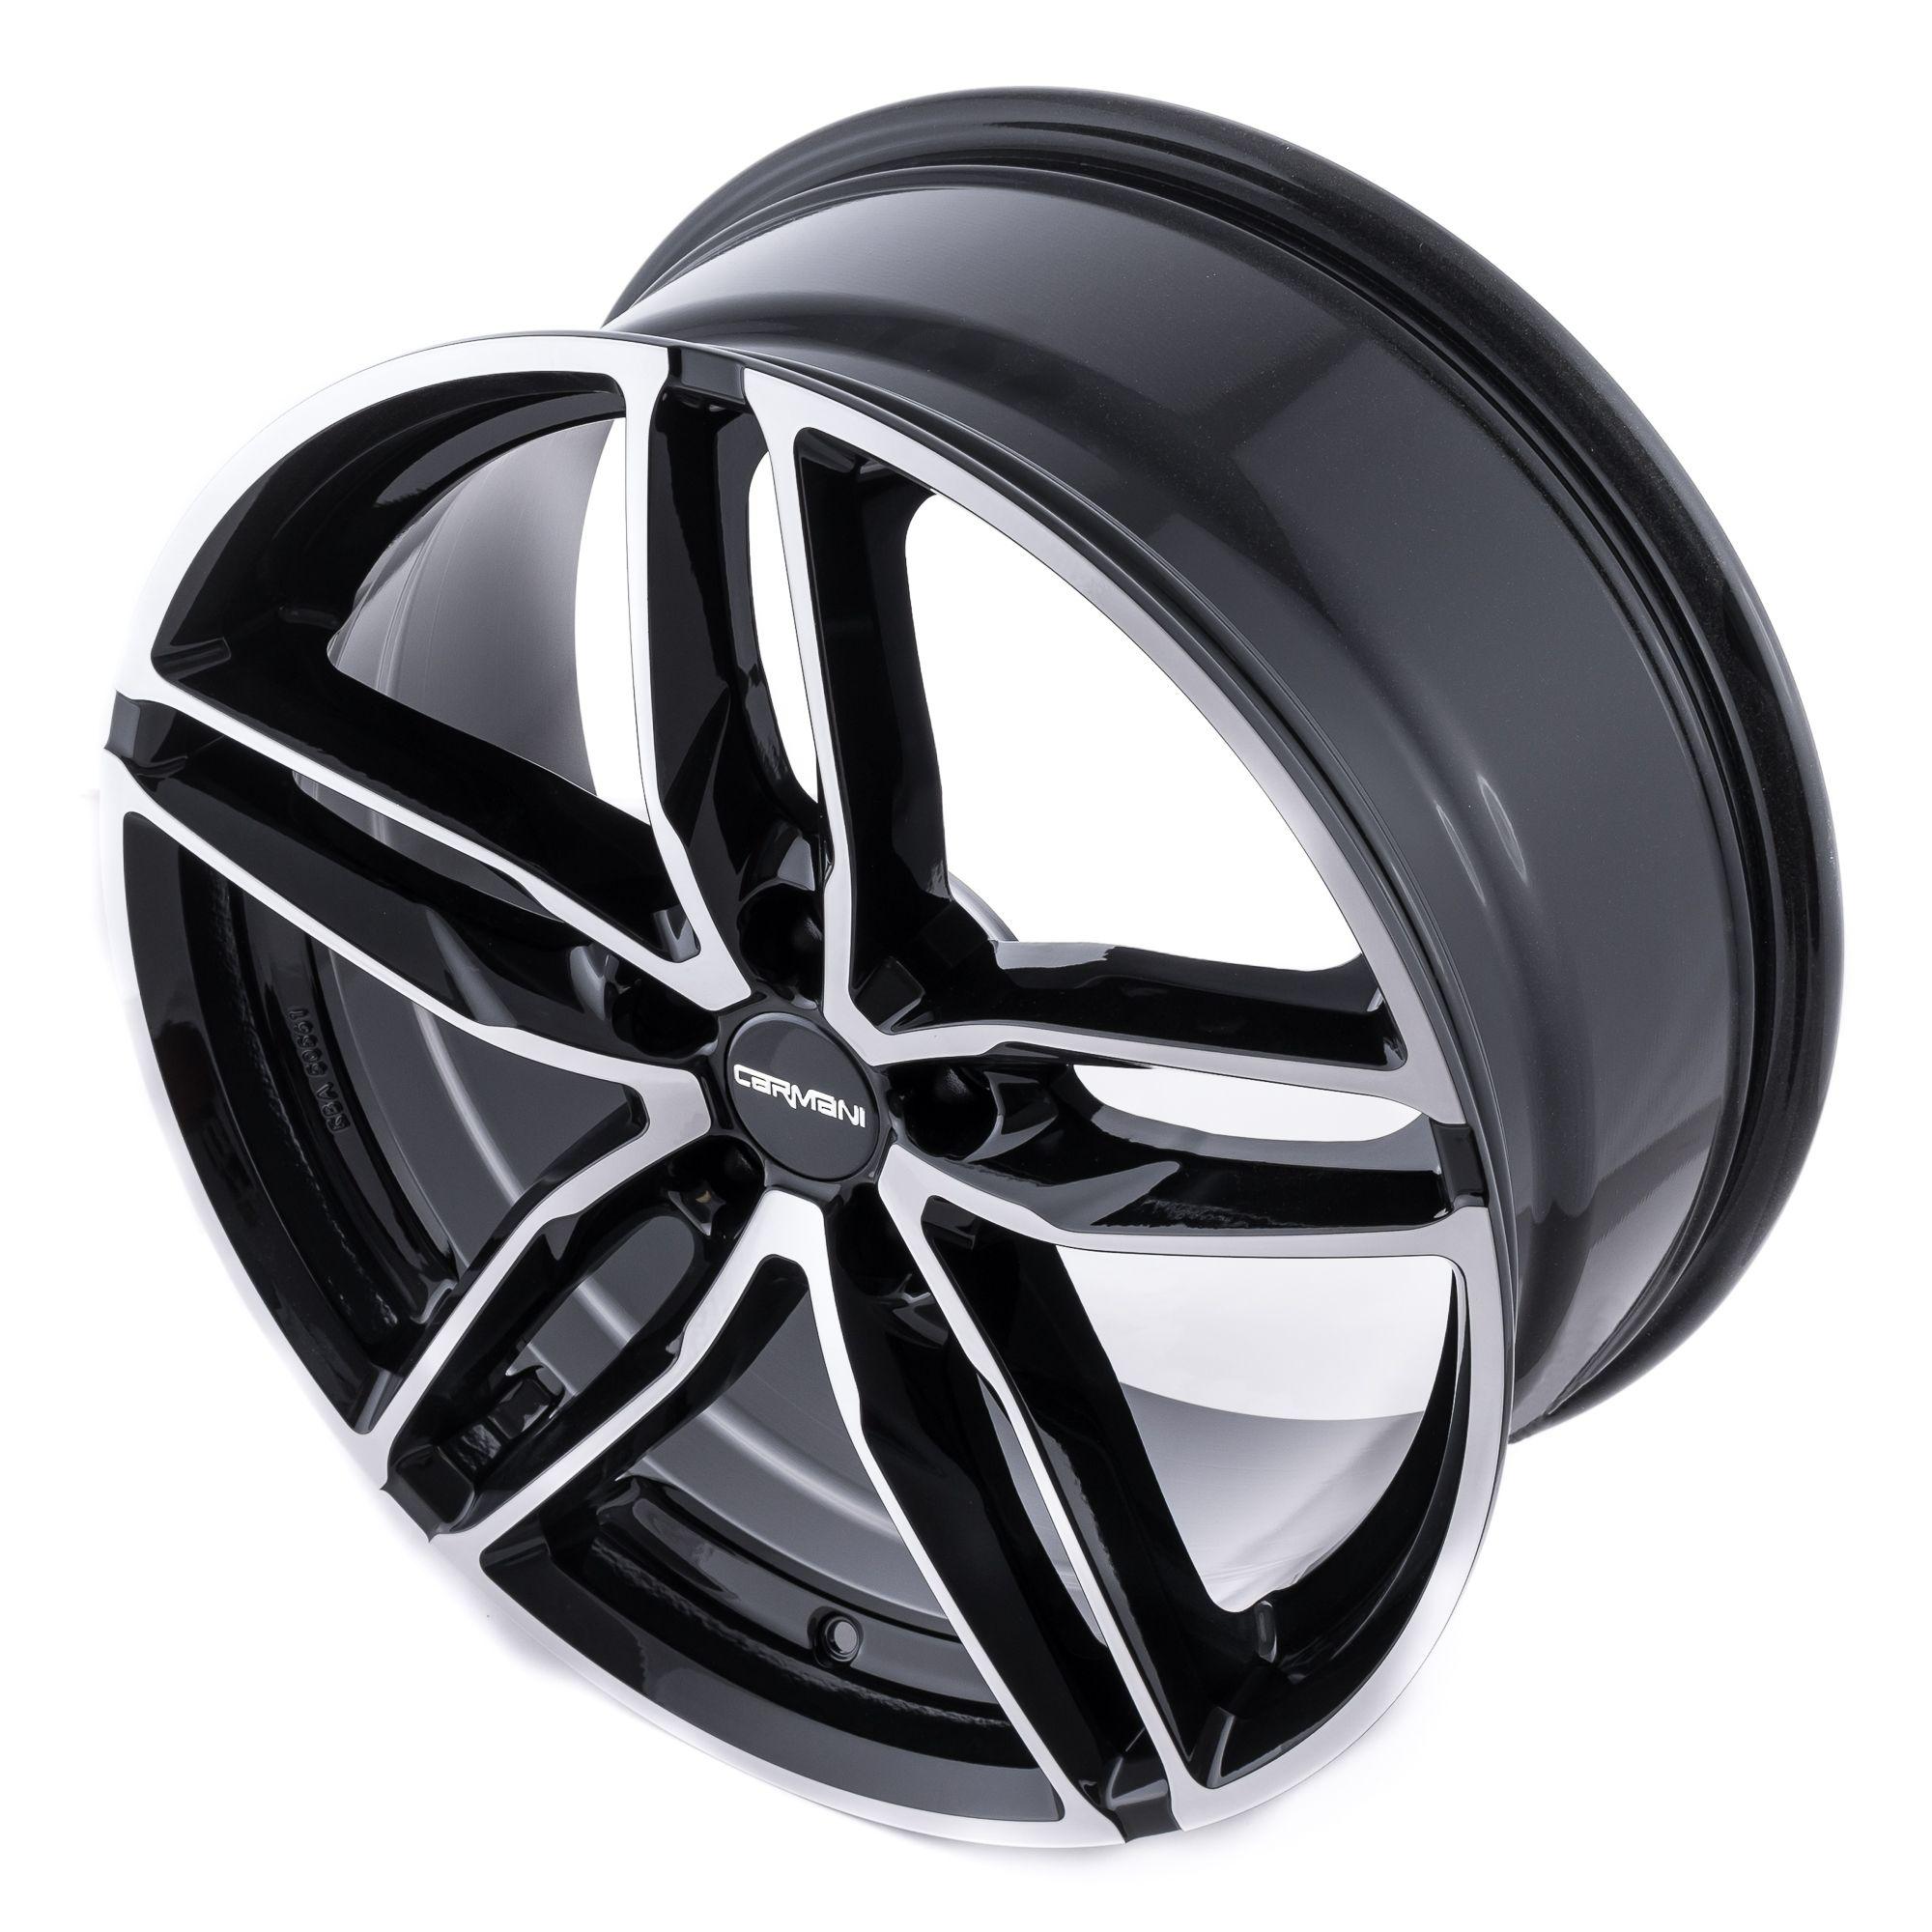 carmani 13 twinmax felgen black polish silber schwarz. Black Bedroom Furniture Sets. Home Design Ideas